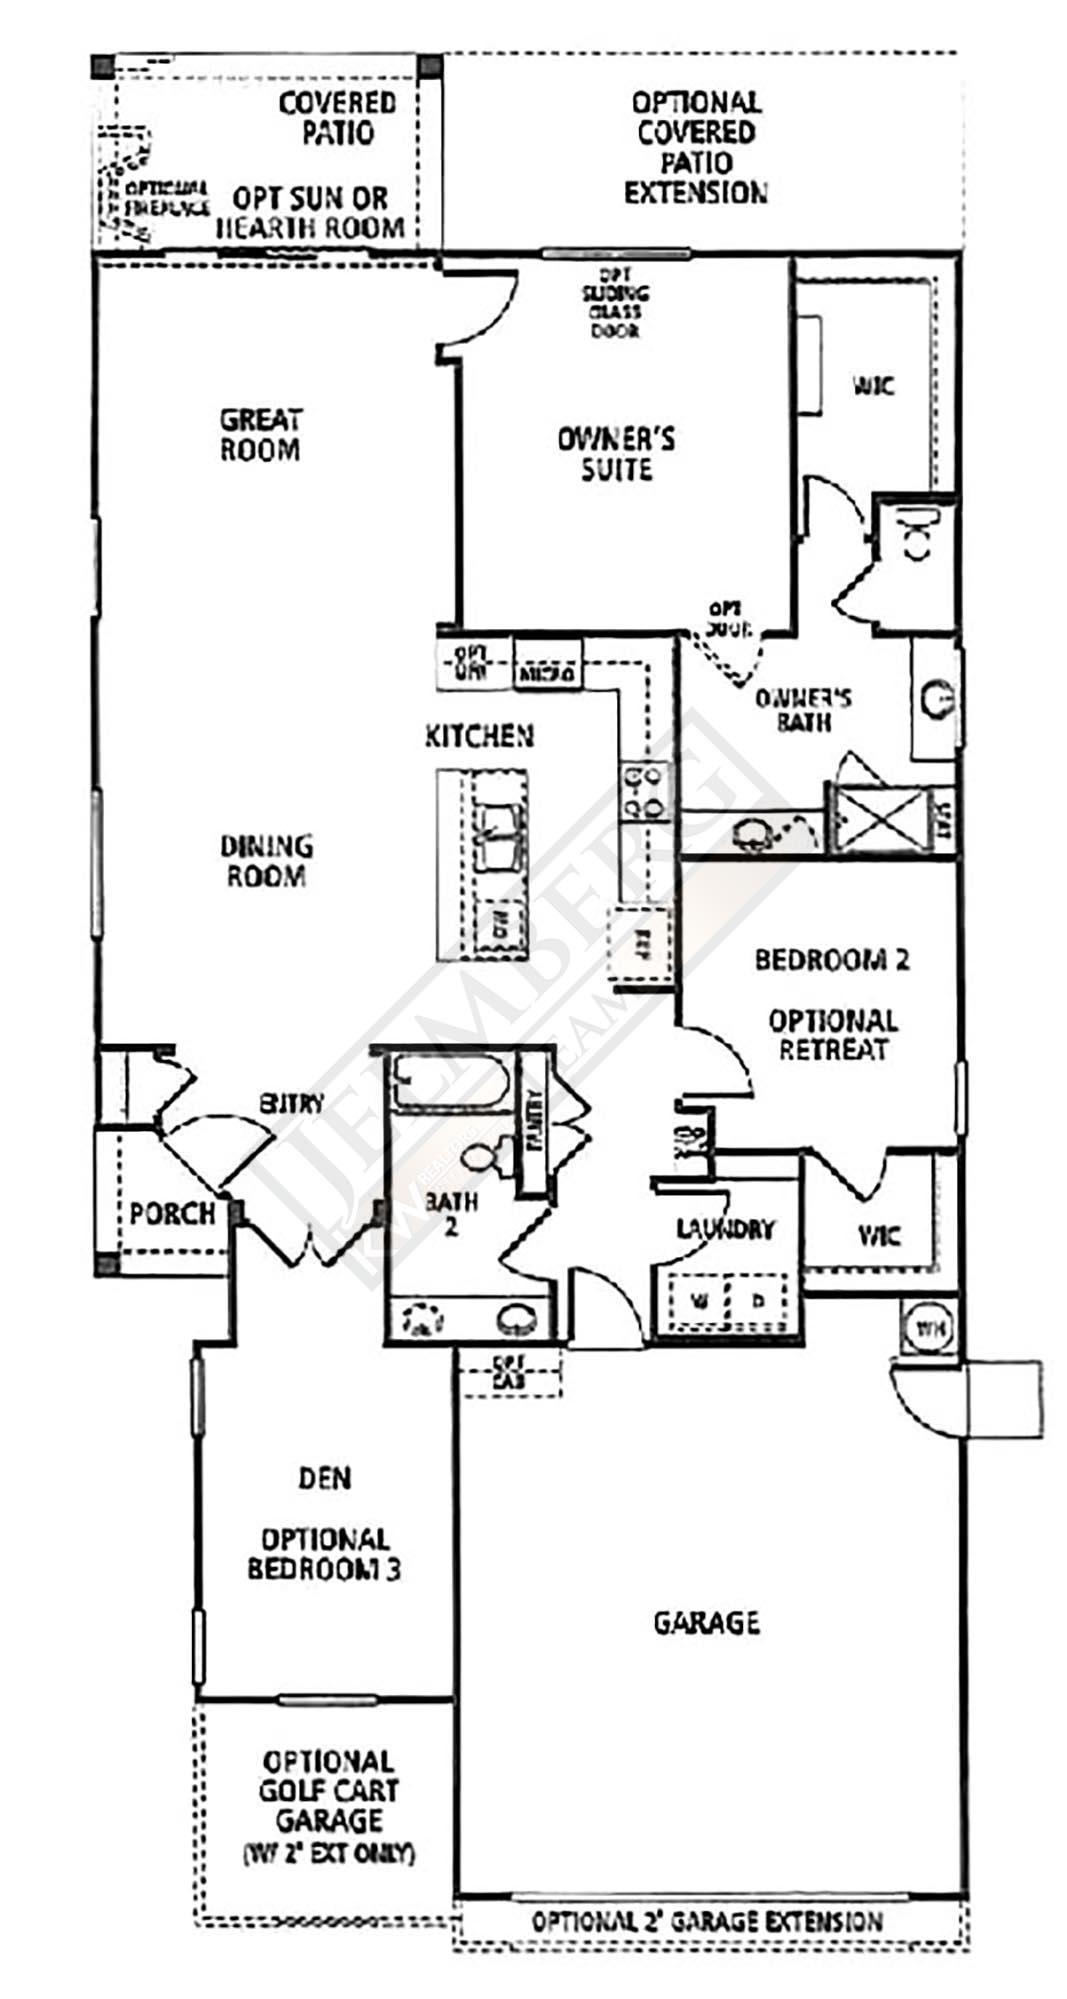 Inspiration Model Floor Plan Sun City Shadow Hills Coachella Valley Area Real Estate The Jelmberg Team